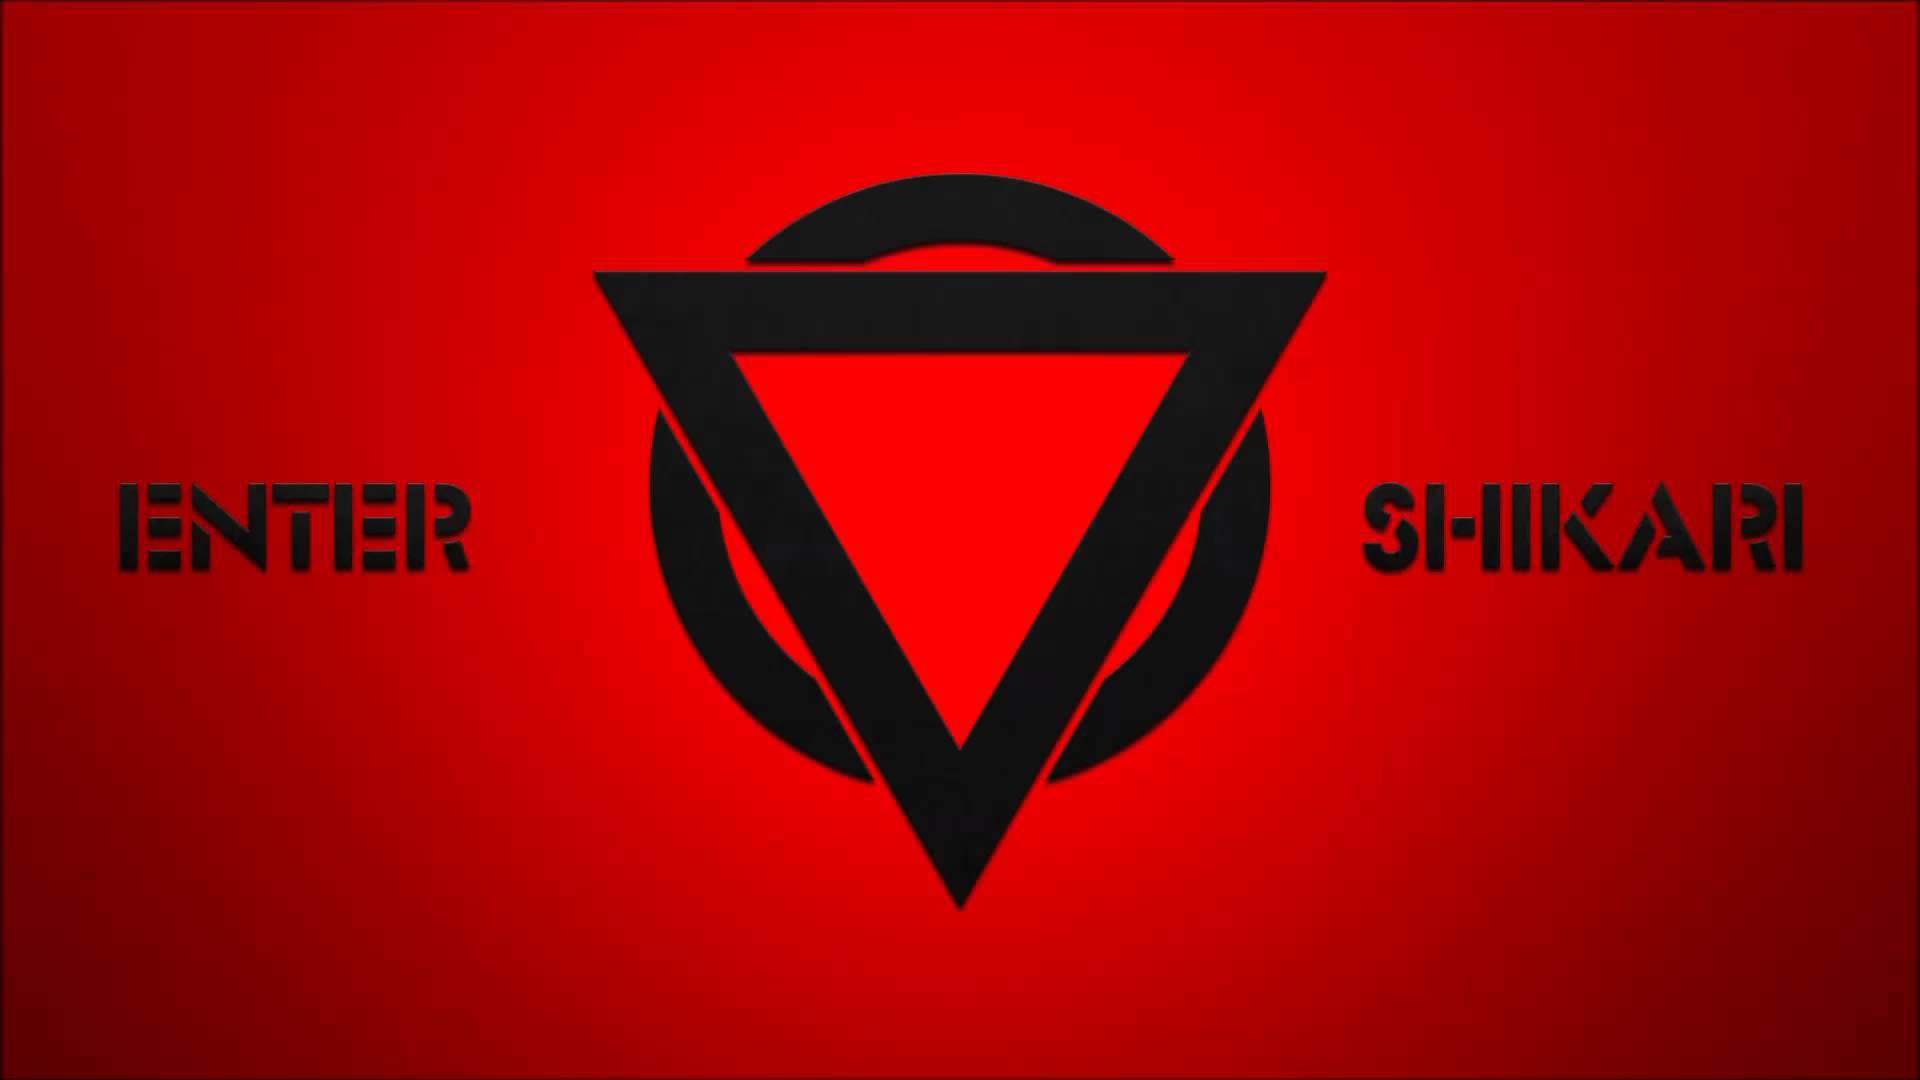 Enter Shikari Hd Desktop